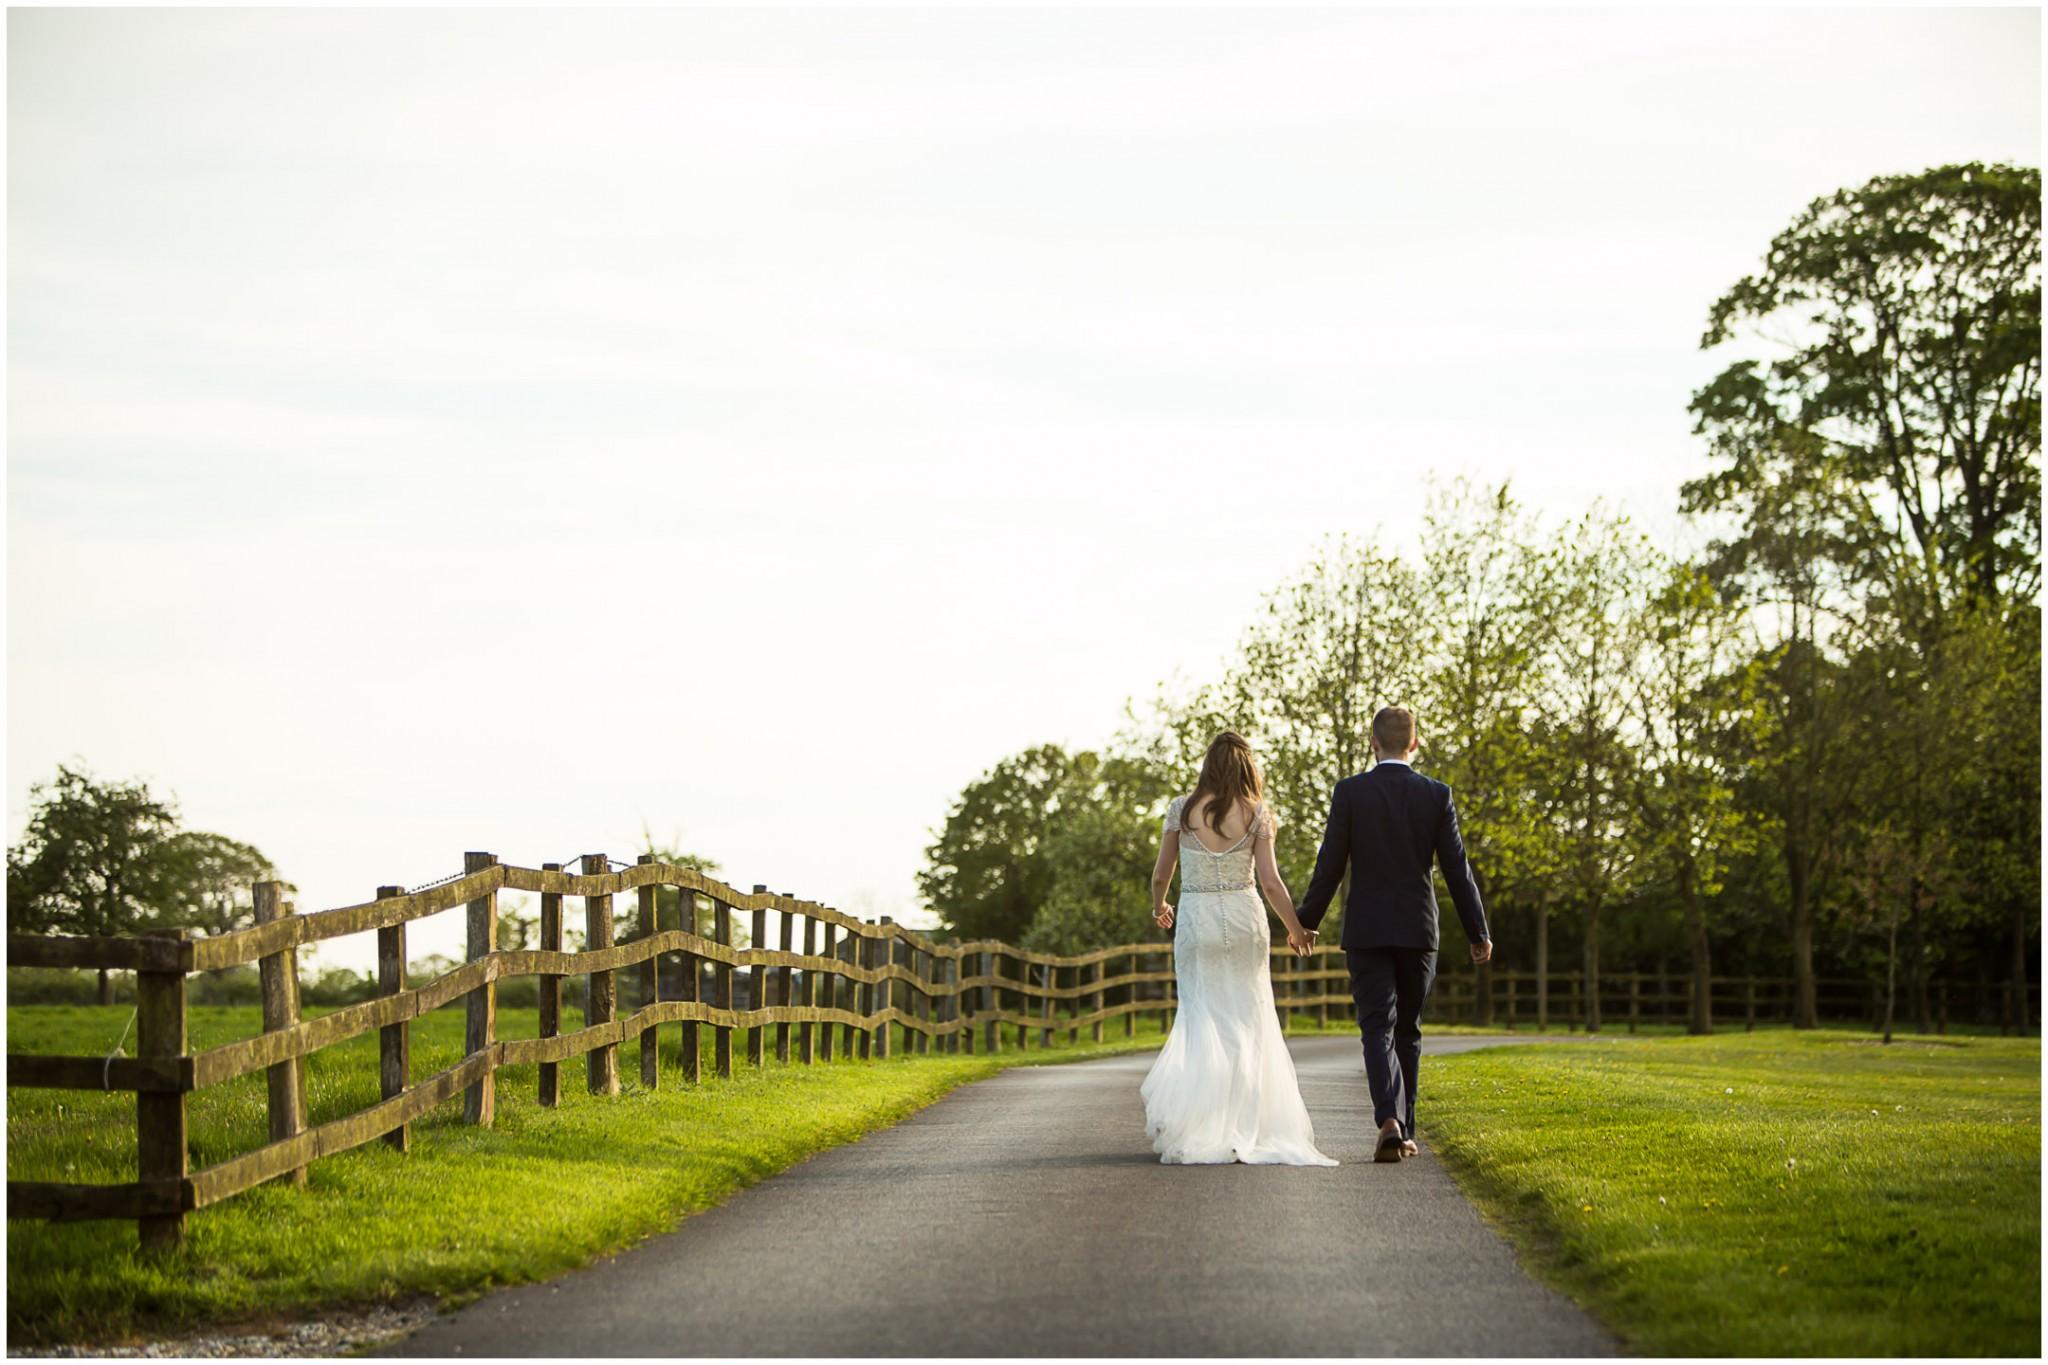 Wasing Park Wedding Photography Bride & Groom walking together